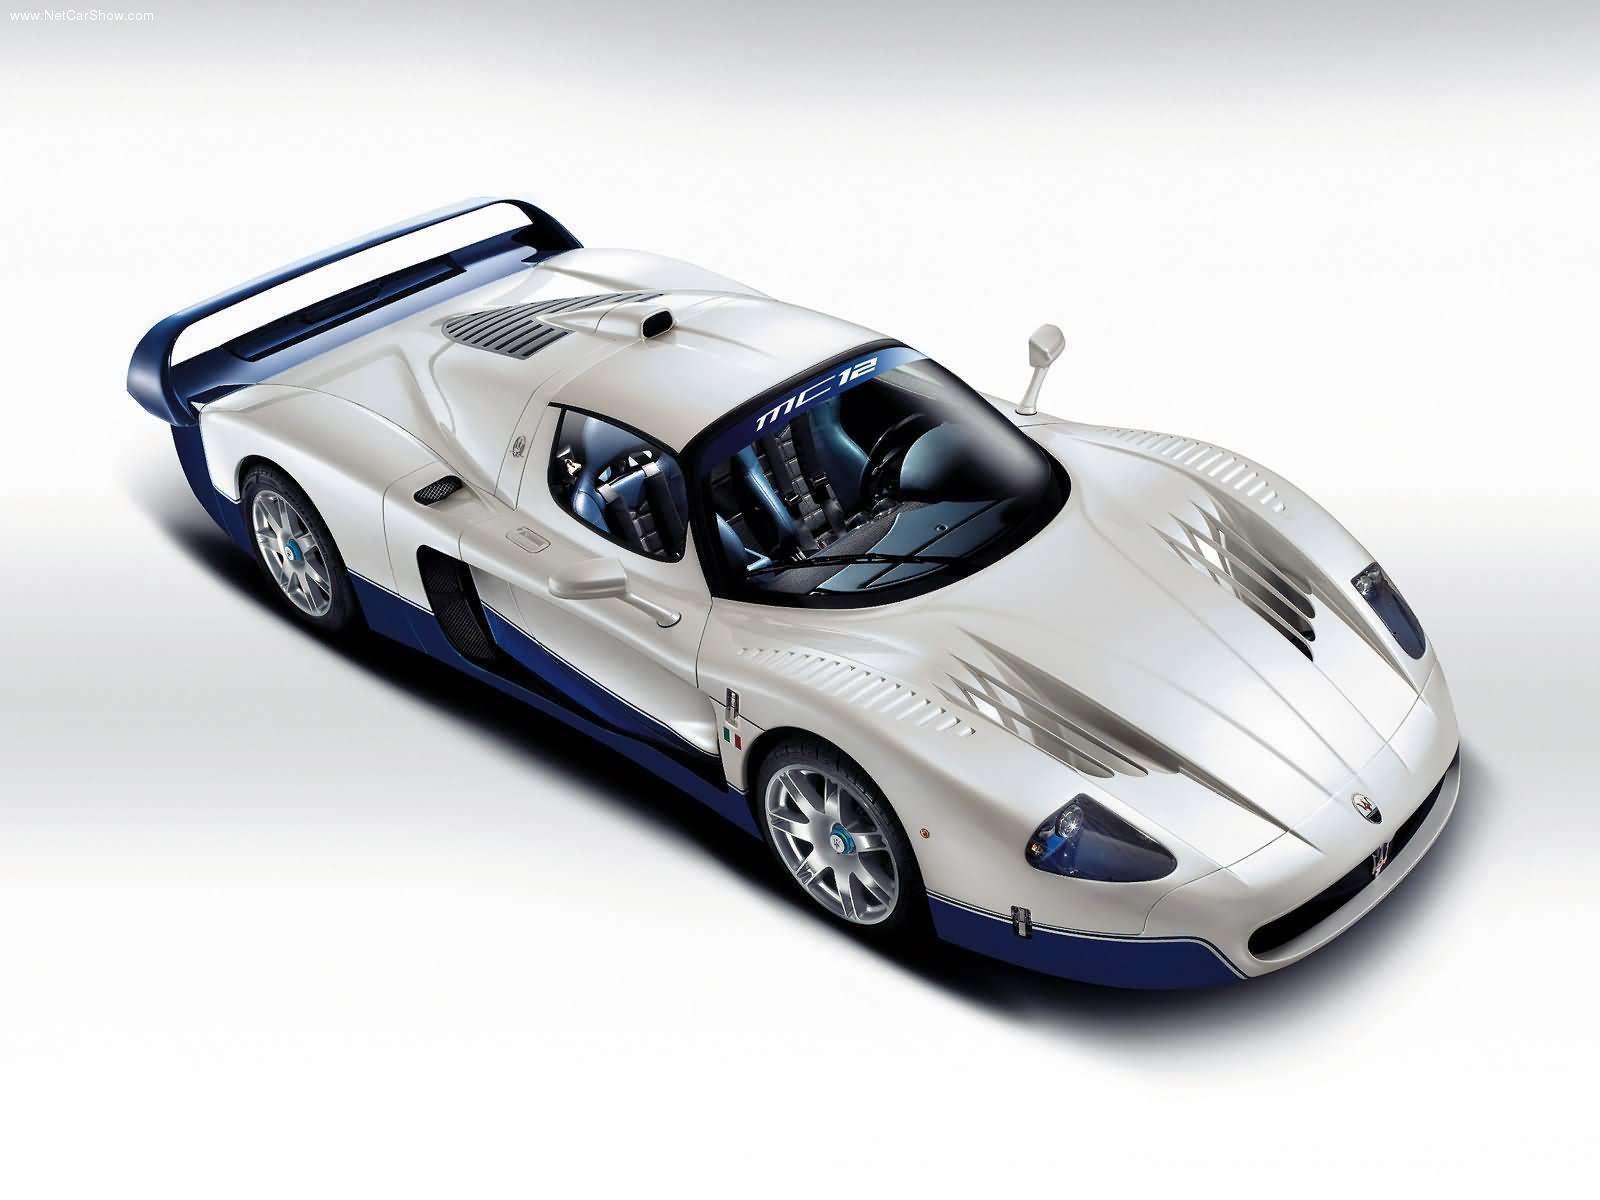 Maserati-MC12_2004_1600x1200_wallpaper_01